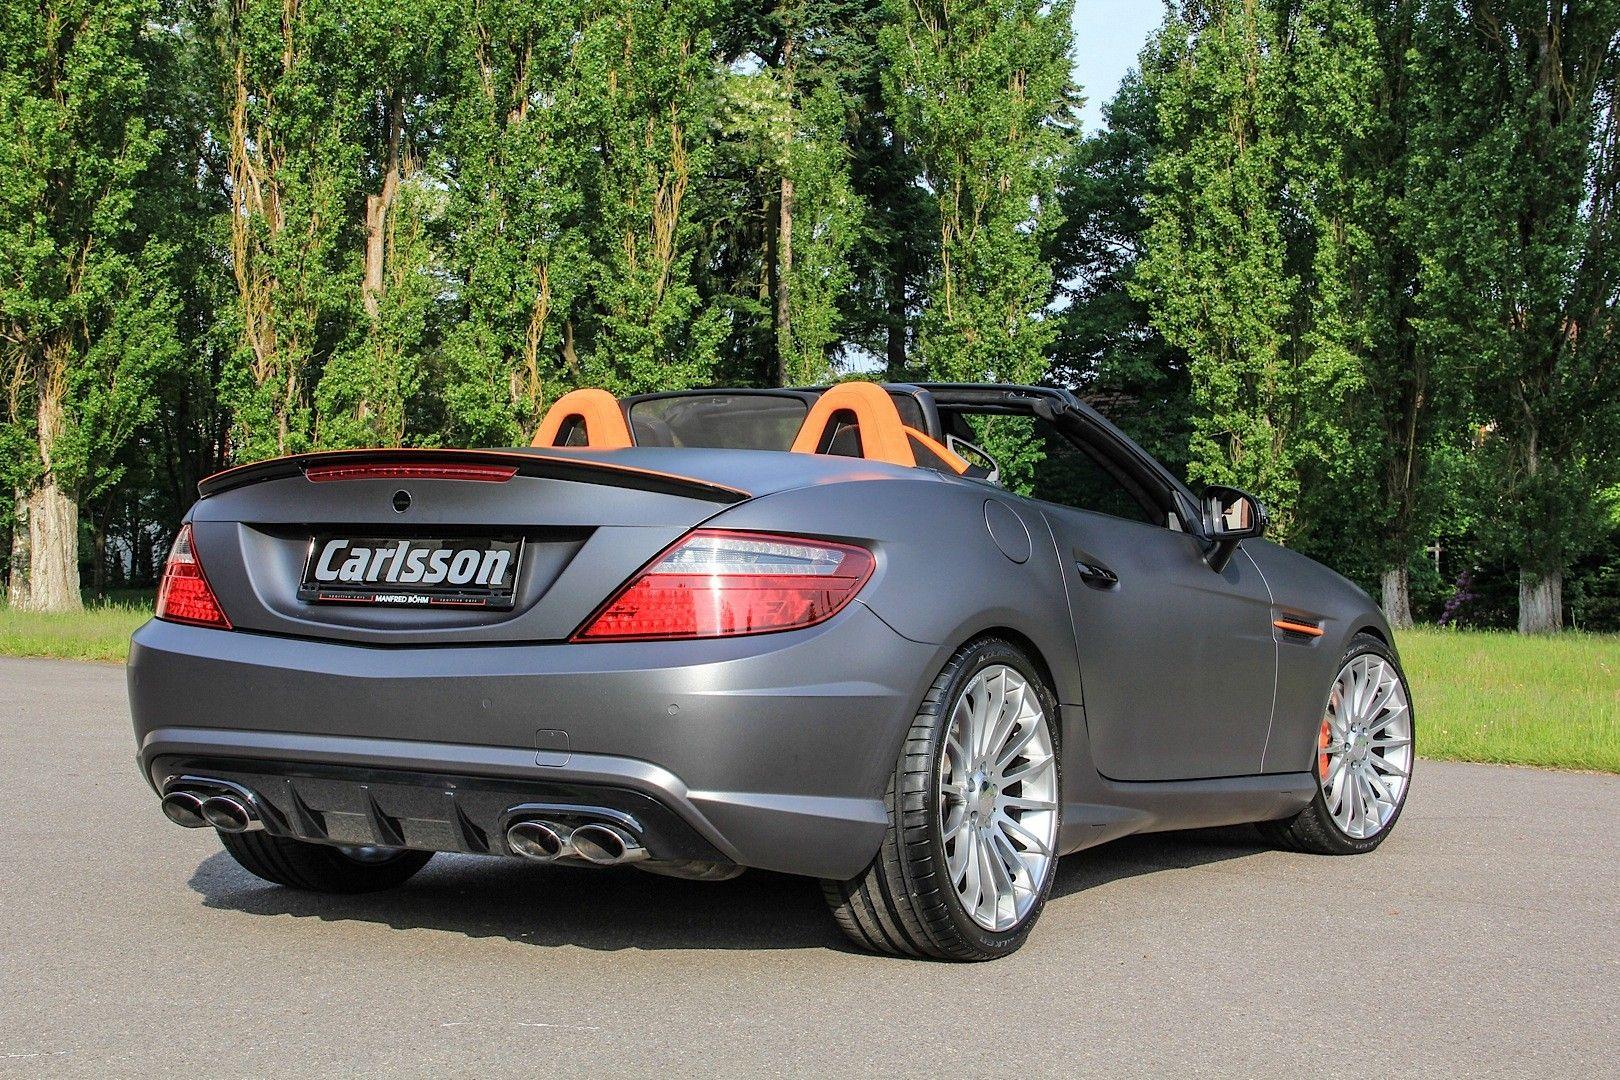 Carlsson Mercedes Benz Slk 55 Amg With Images Mercedes Benz